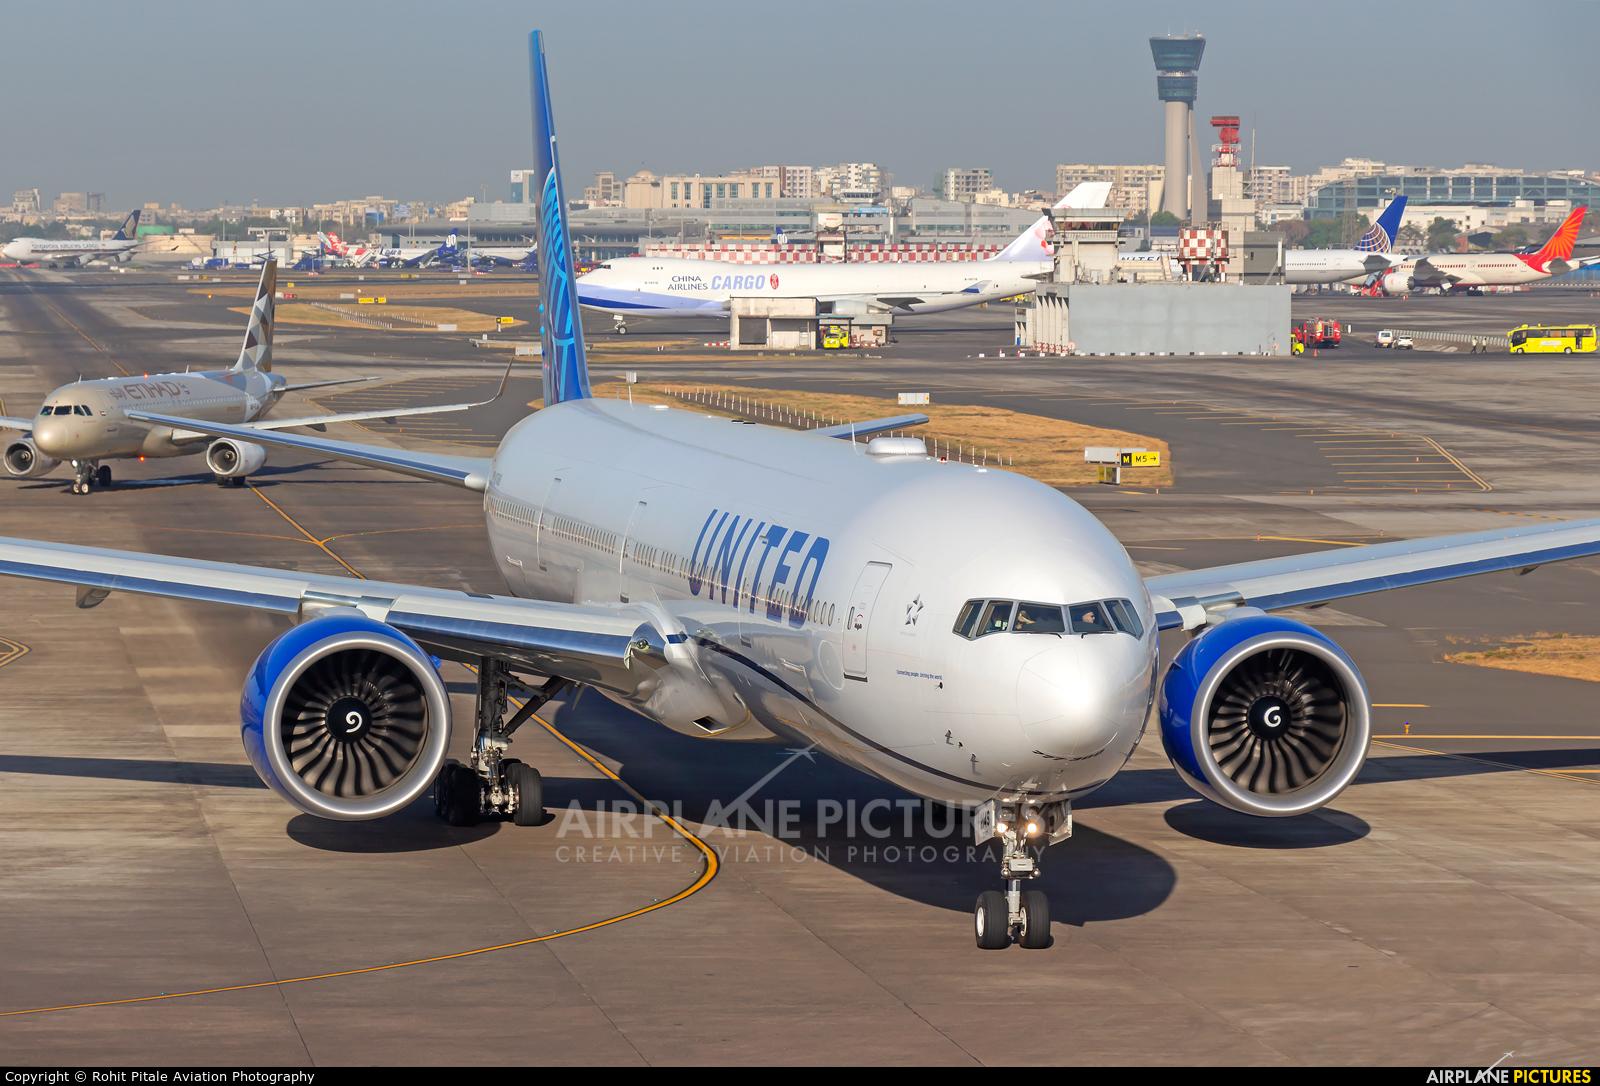 United Airlines N2749U aircraft at Mumbai - Chhatrapati Shivaji Intl